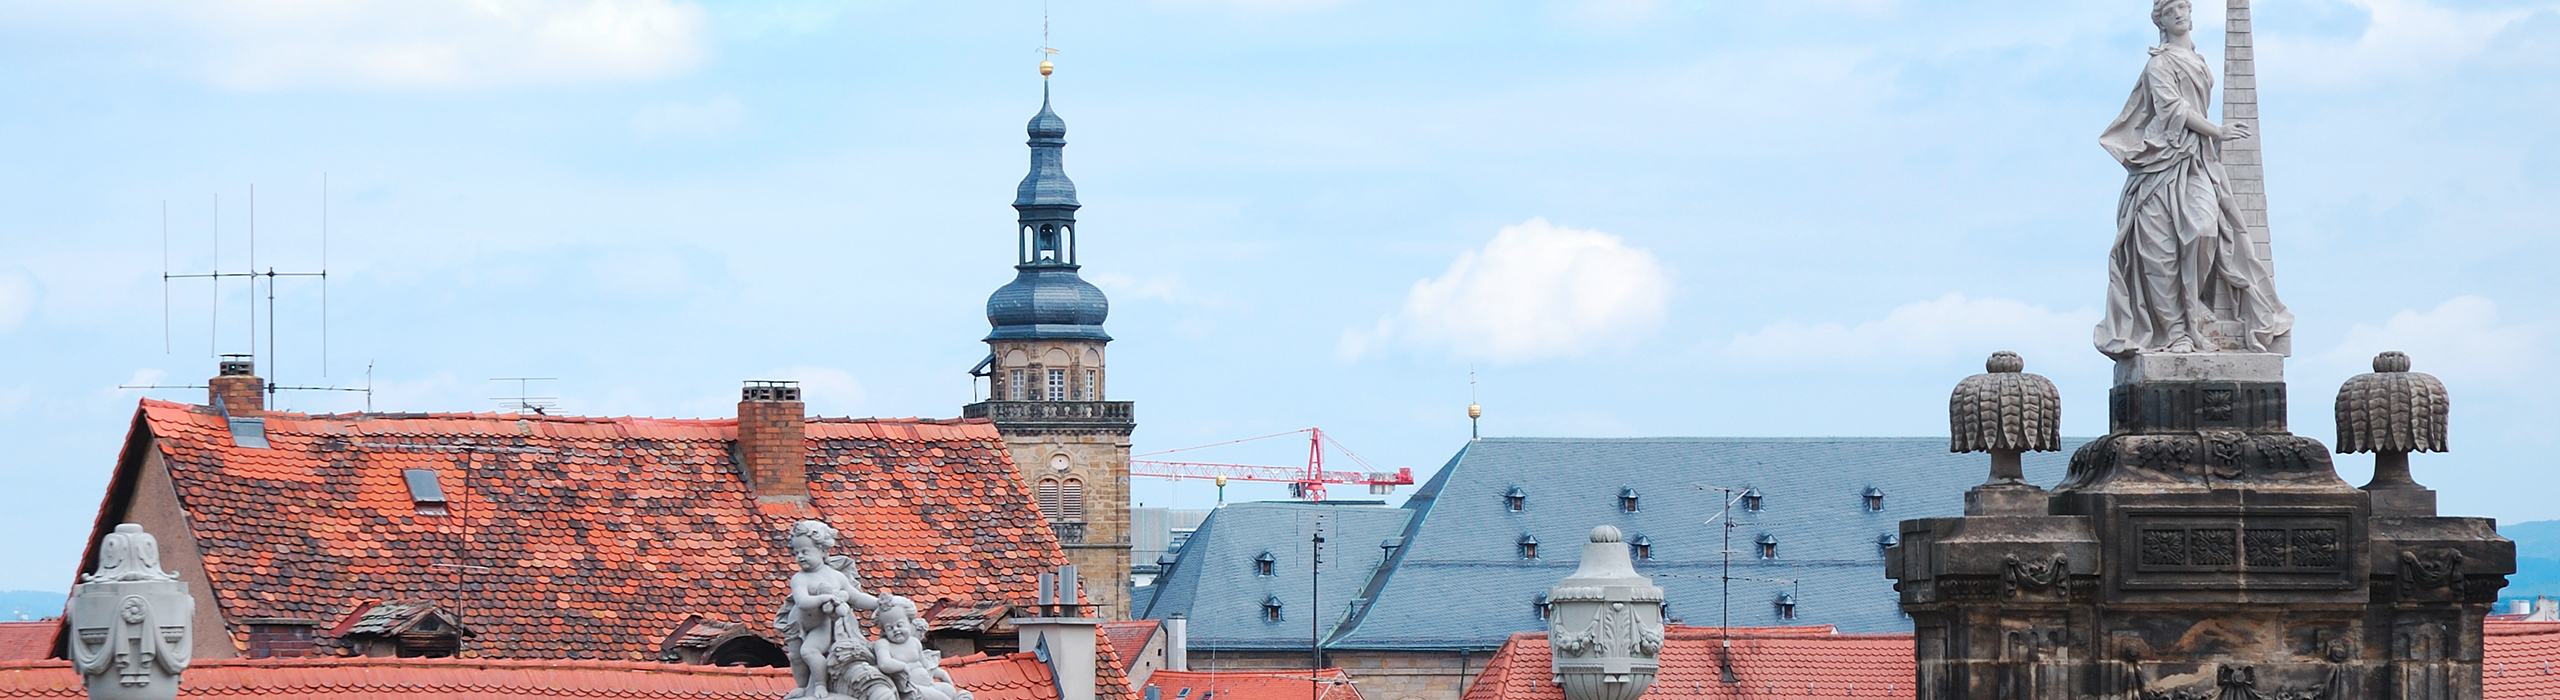 Domplatz Bamberg